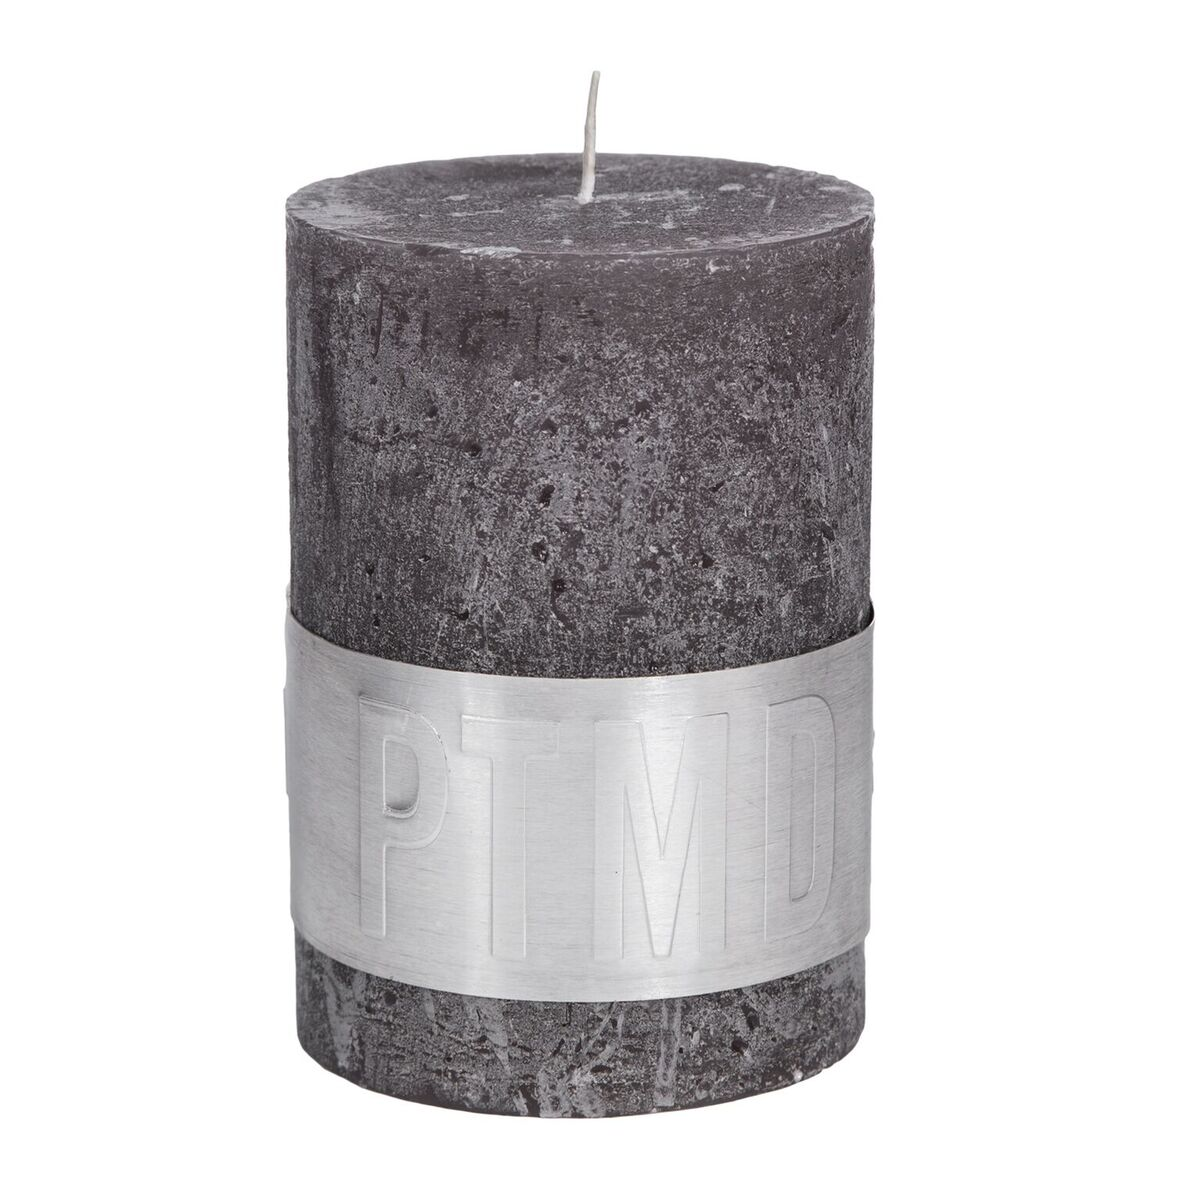 PTMD Kaars swish grey 10x7cm